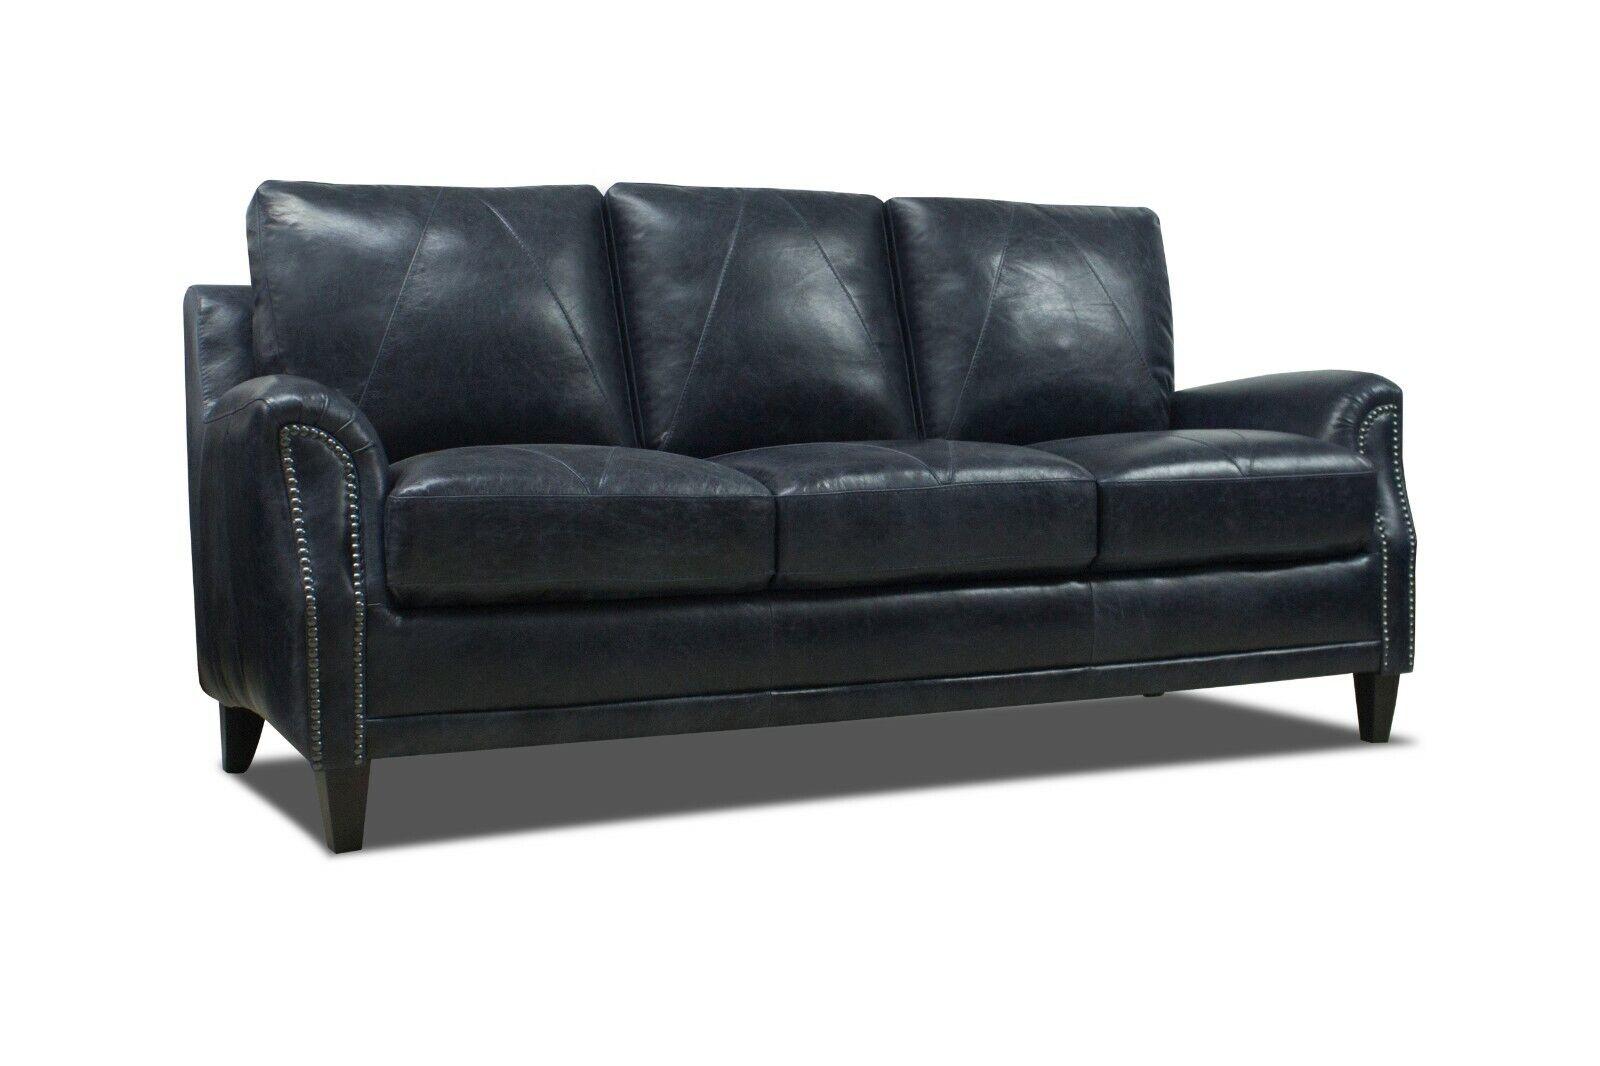 Amazing New Luke Leather Furniture Anja Midnight Blue Genuine Italian Leather Sofa Interior Design Ideas Gentotthenellocom